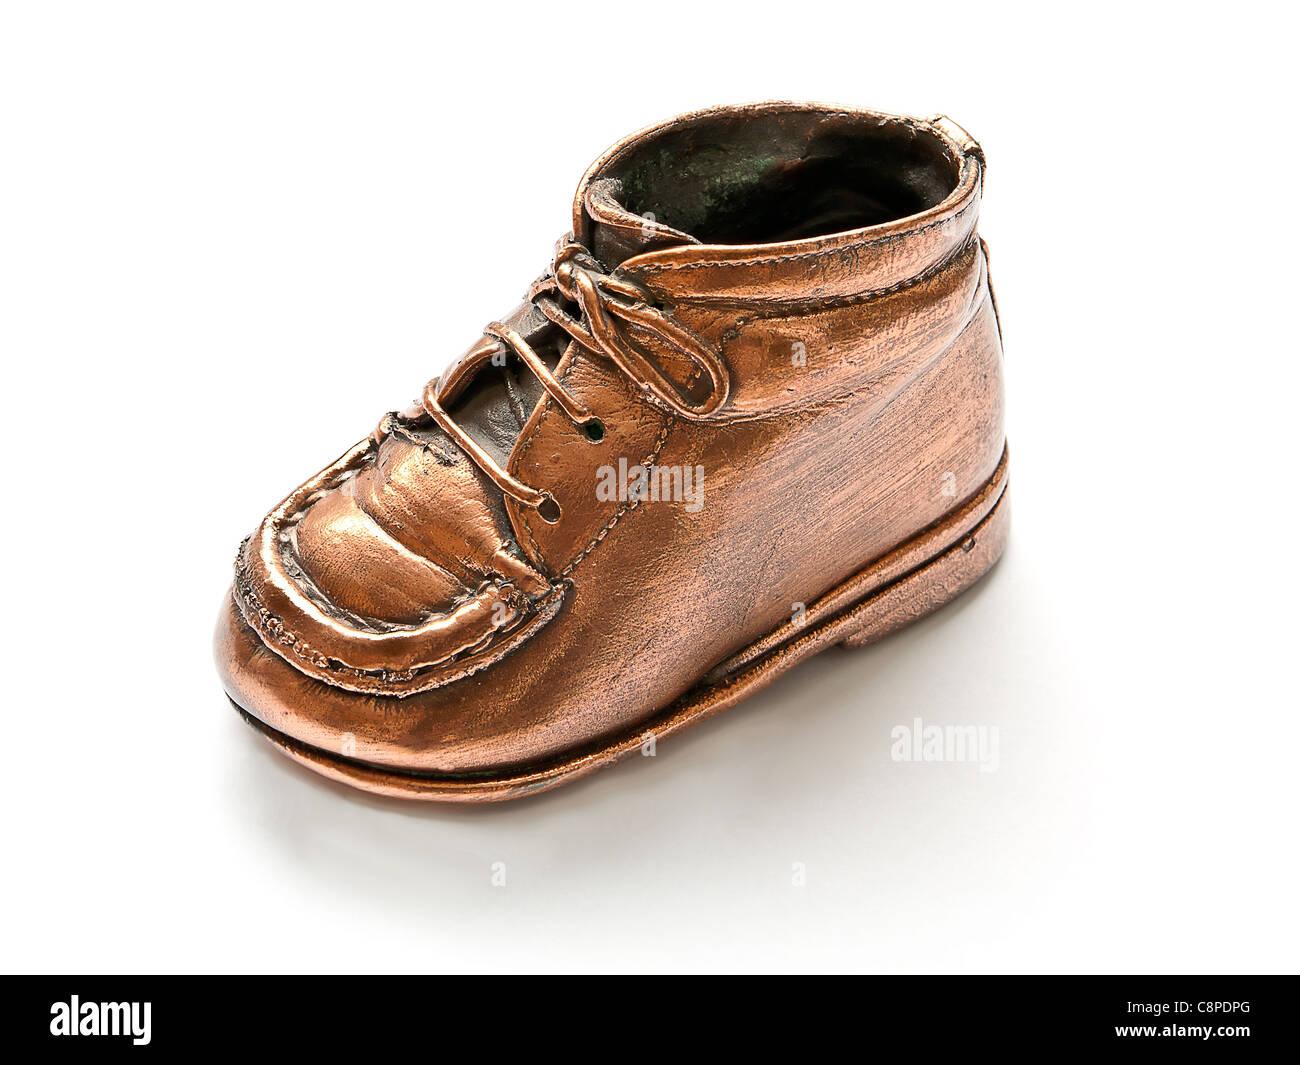 Metallic Shoe Stock Photos Images Alamy D Island Shoes Style Hikers Dm Mens Leather Cokelat Single Bronze Baby On White Background Image